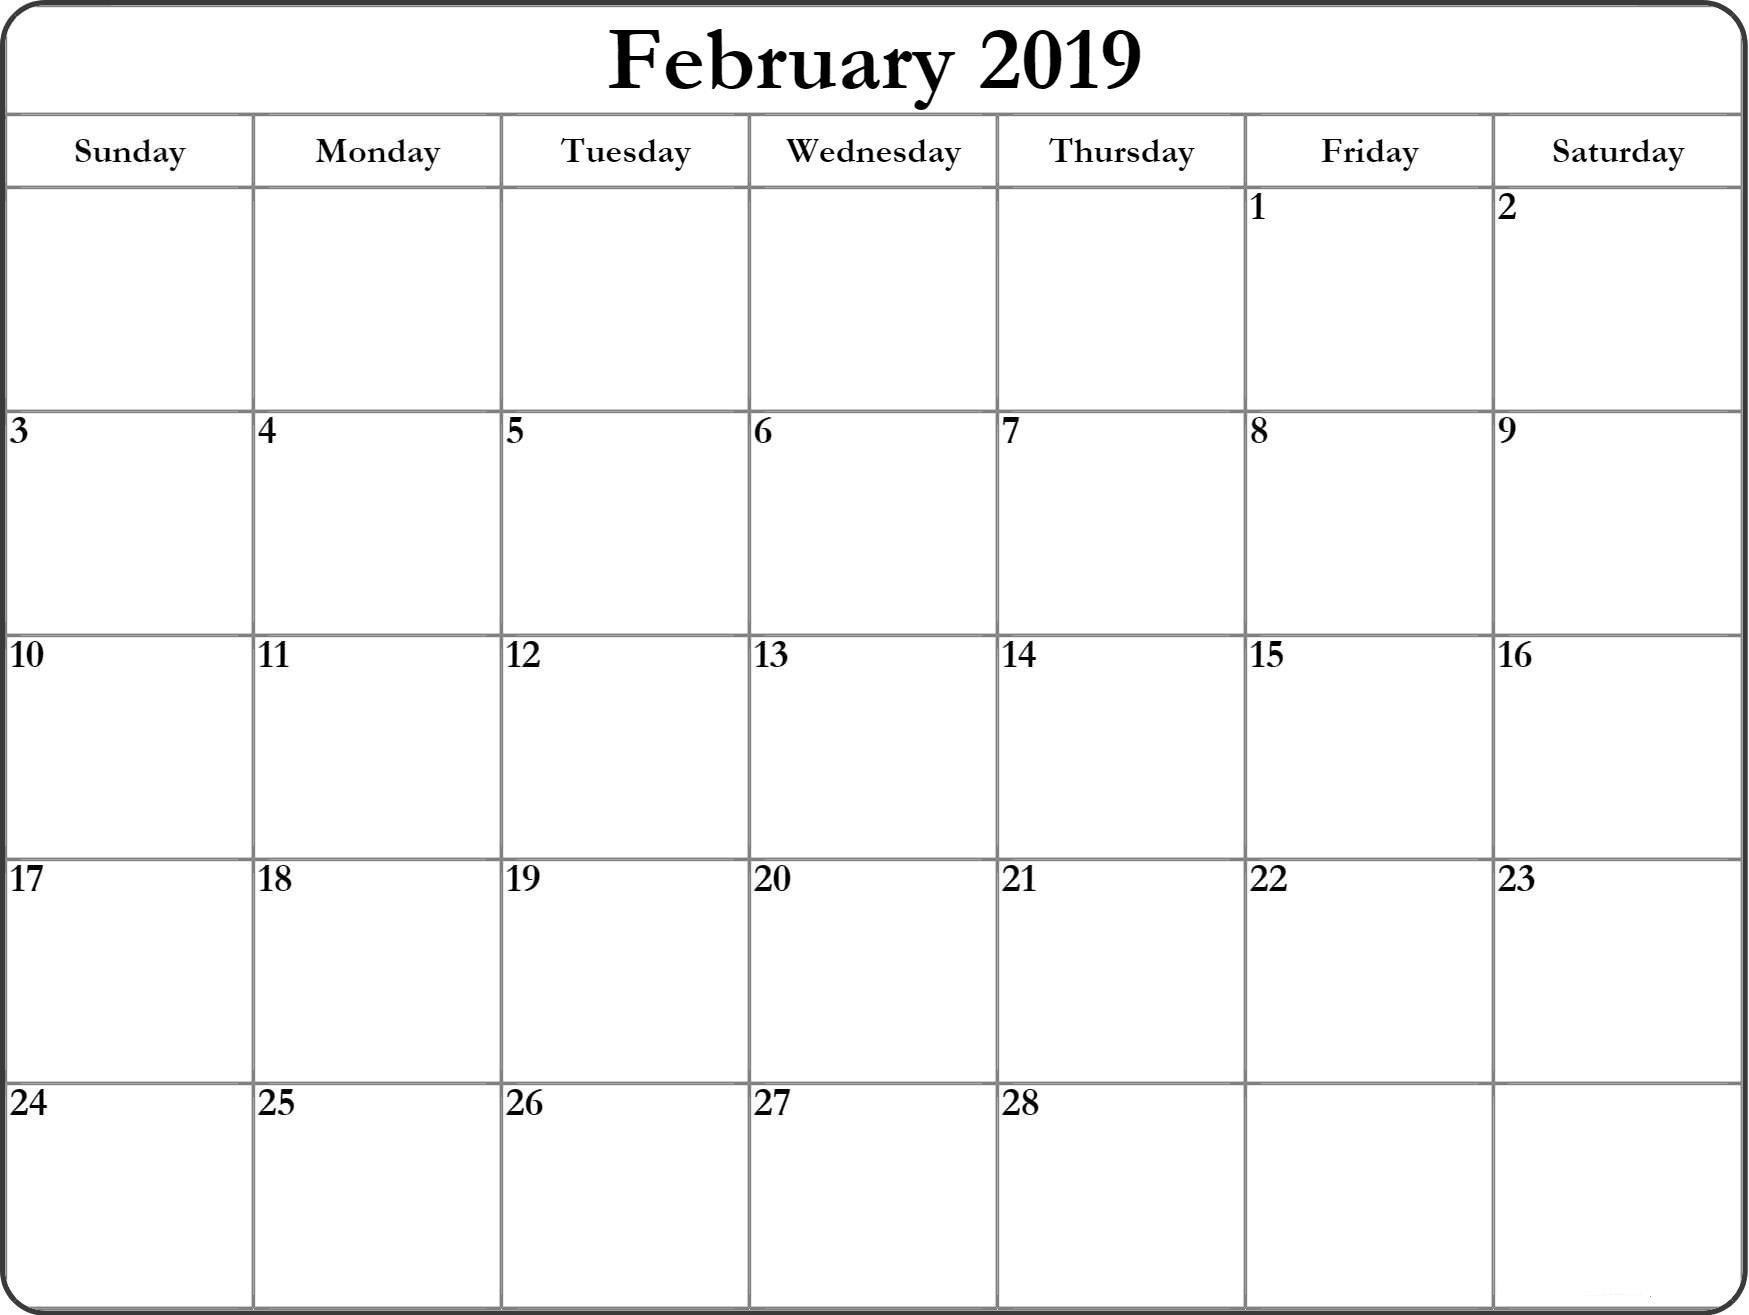 February 2019 Blank Editable Calendar - Free Printable Calendar Calendar 2019 Blank